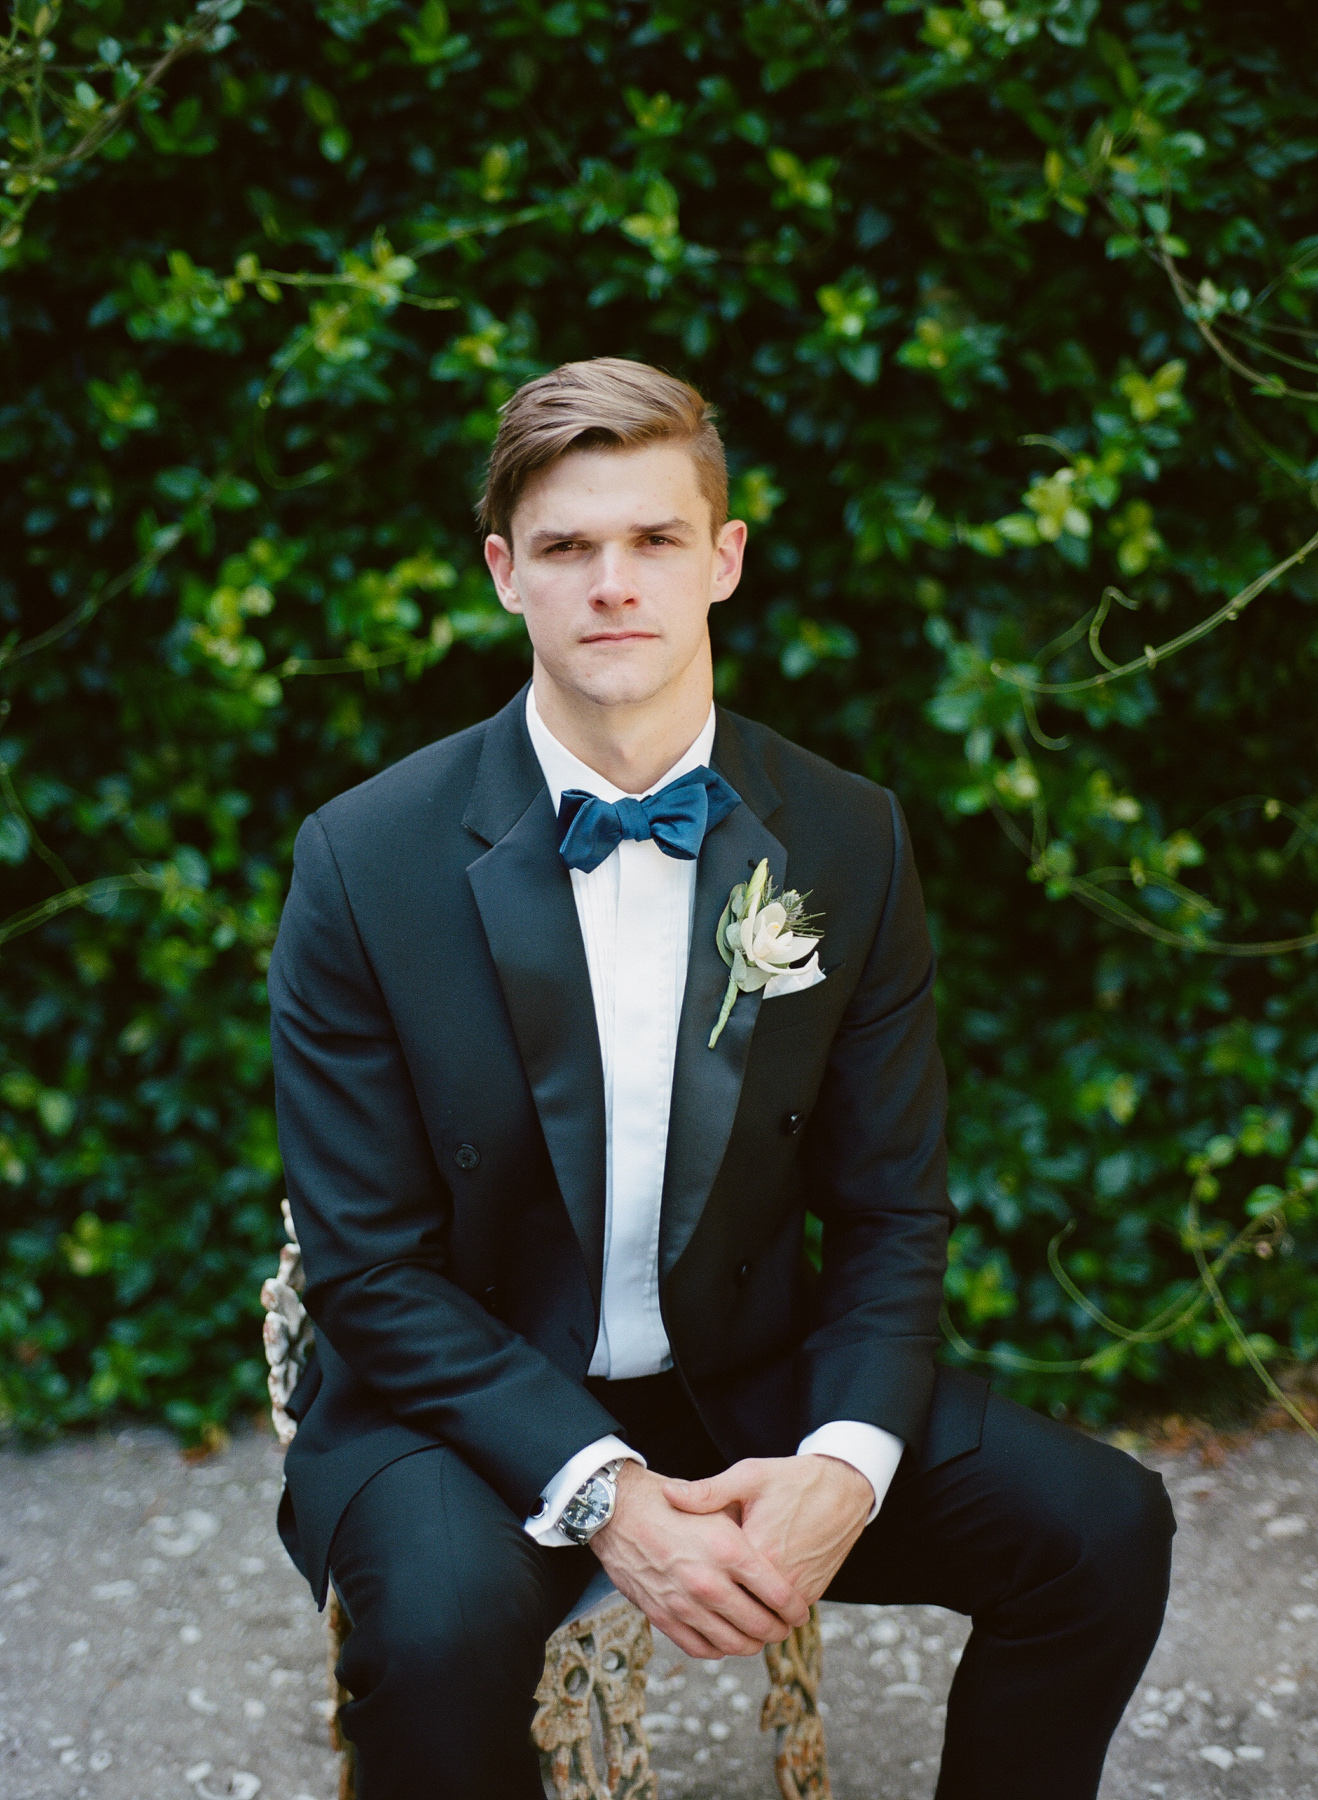 NC-wedding-venues-film-photographer-14.jpg